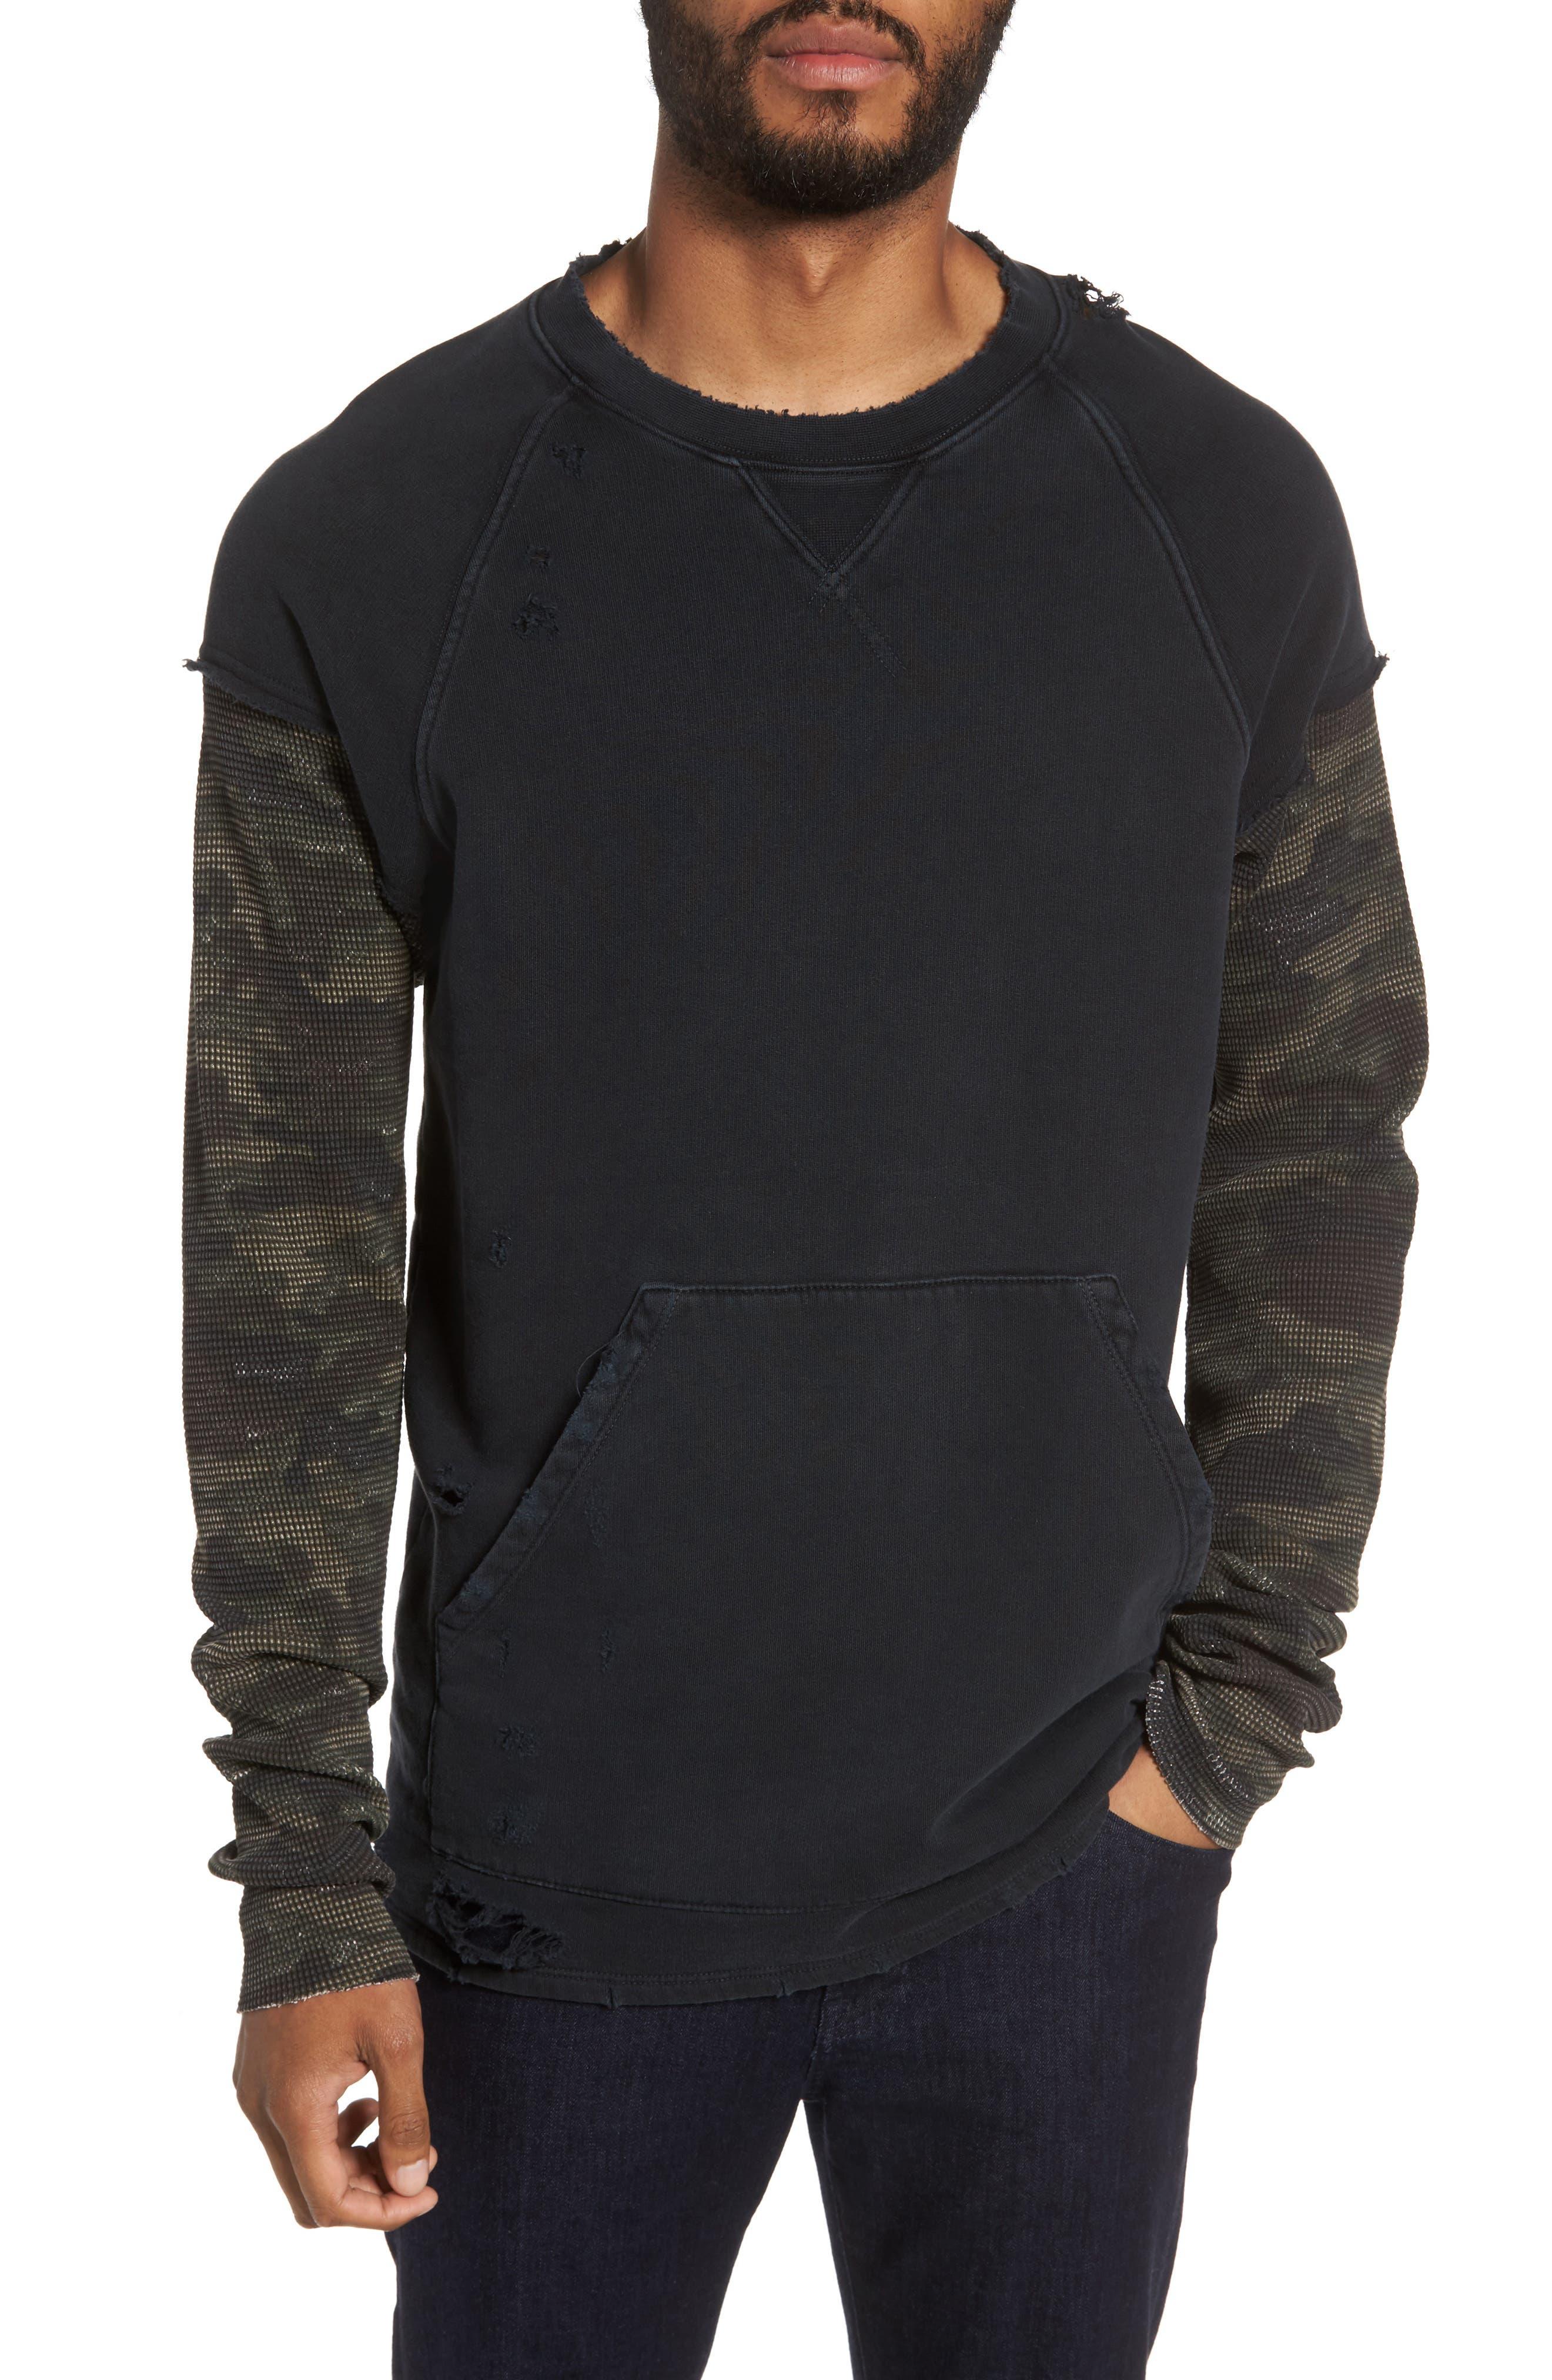 Alternate Image 1 Selected - Hudson Jeans Striker Slim Fit Crewneck Sweatshirt